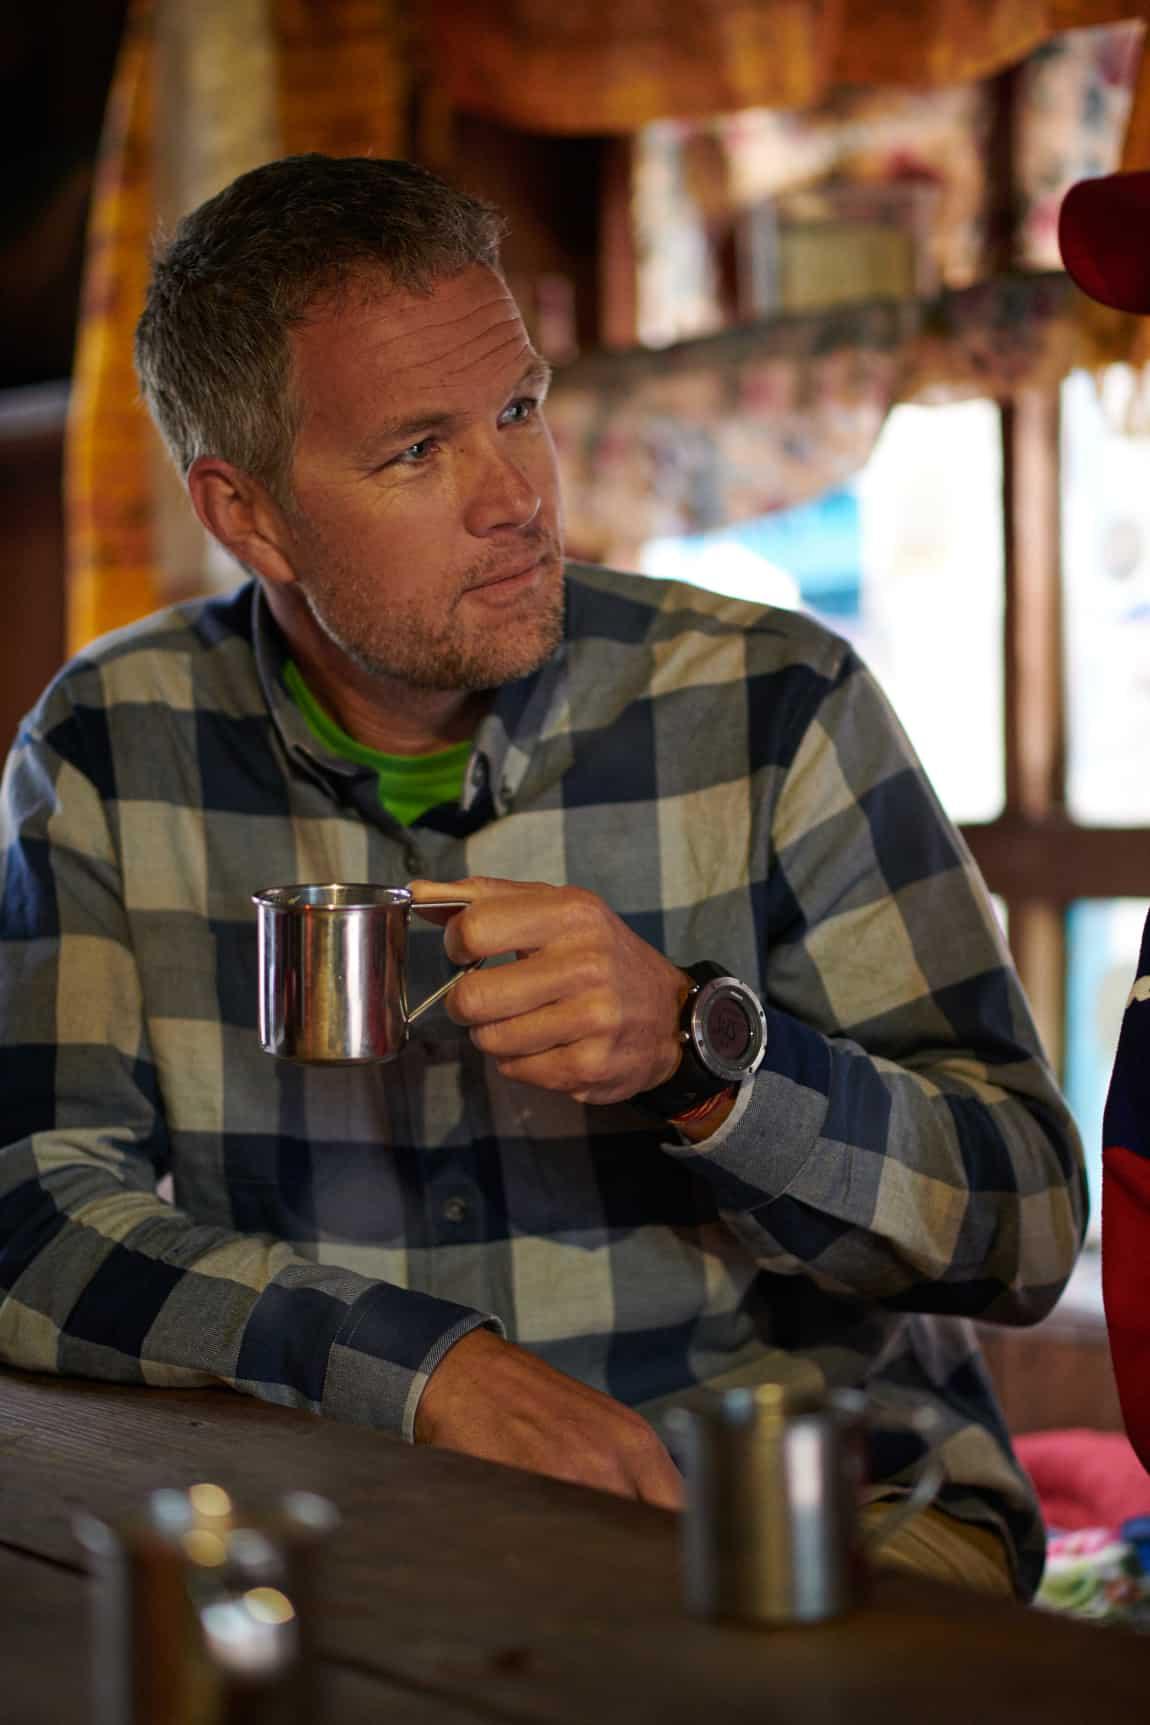 Enjoying a cup of tea and conversation, Nepal. | April, 2018